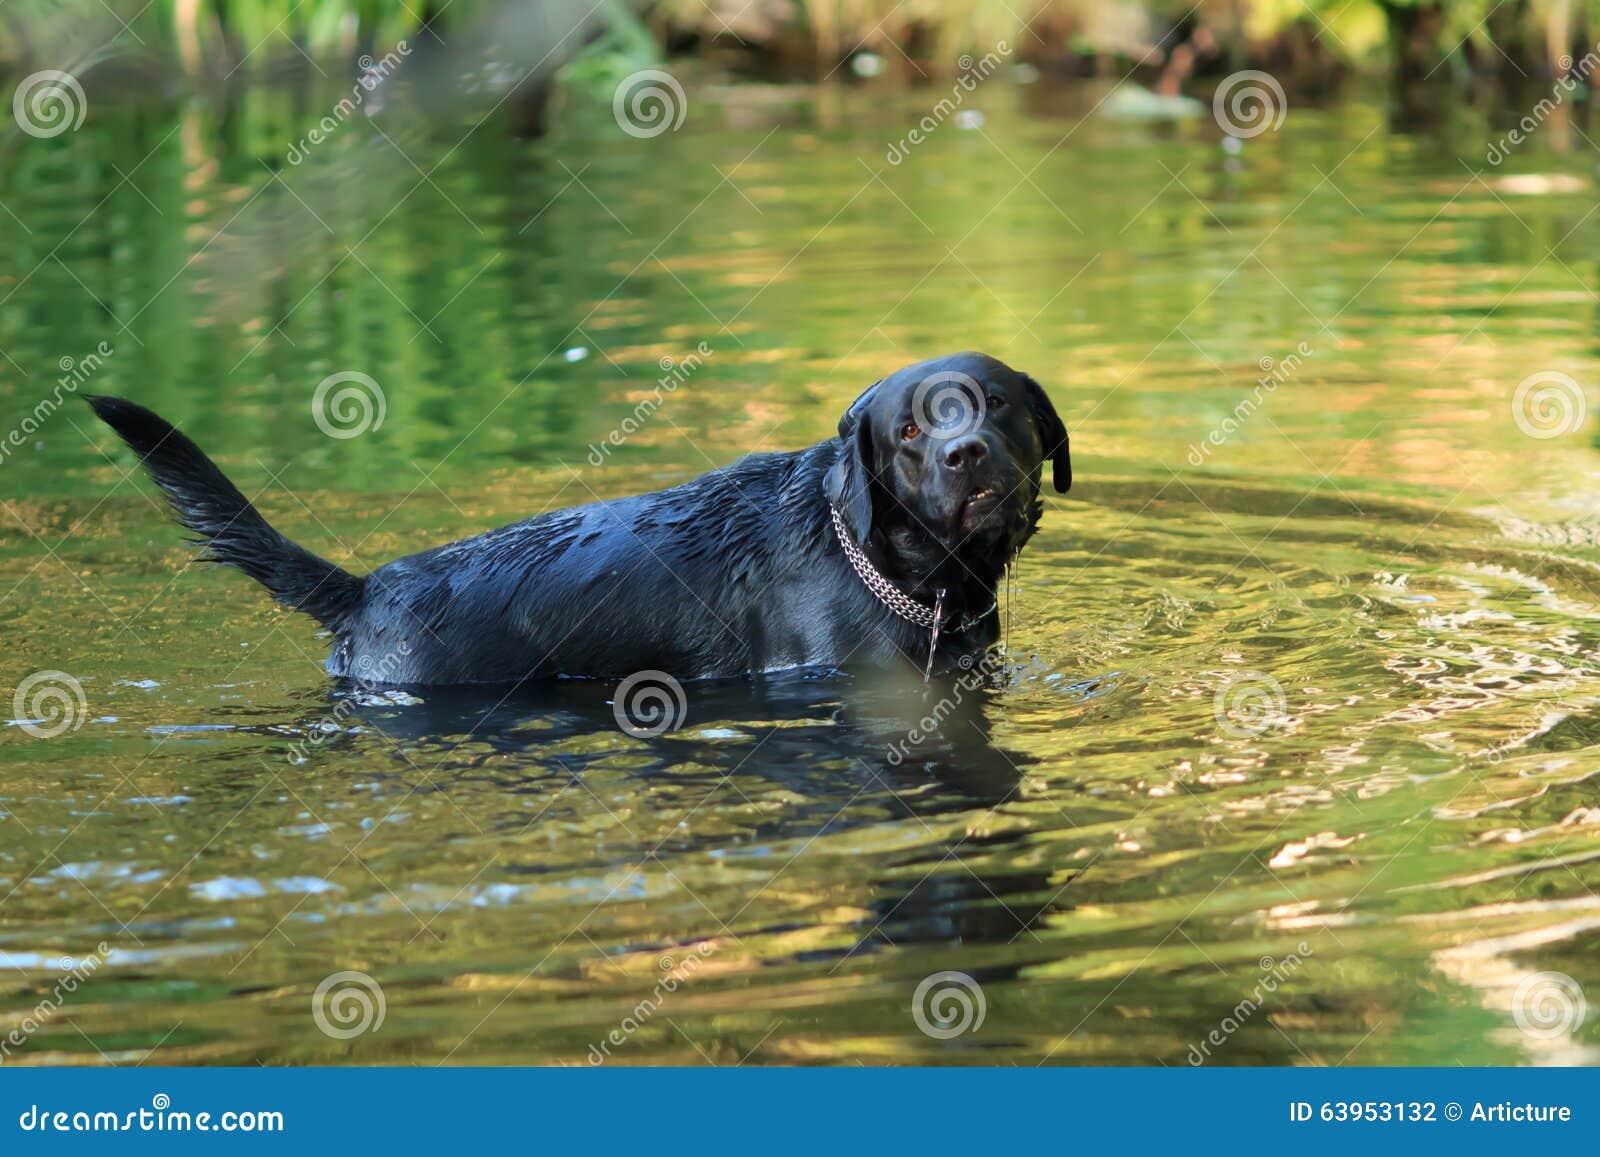 Perro y agua